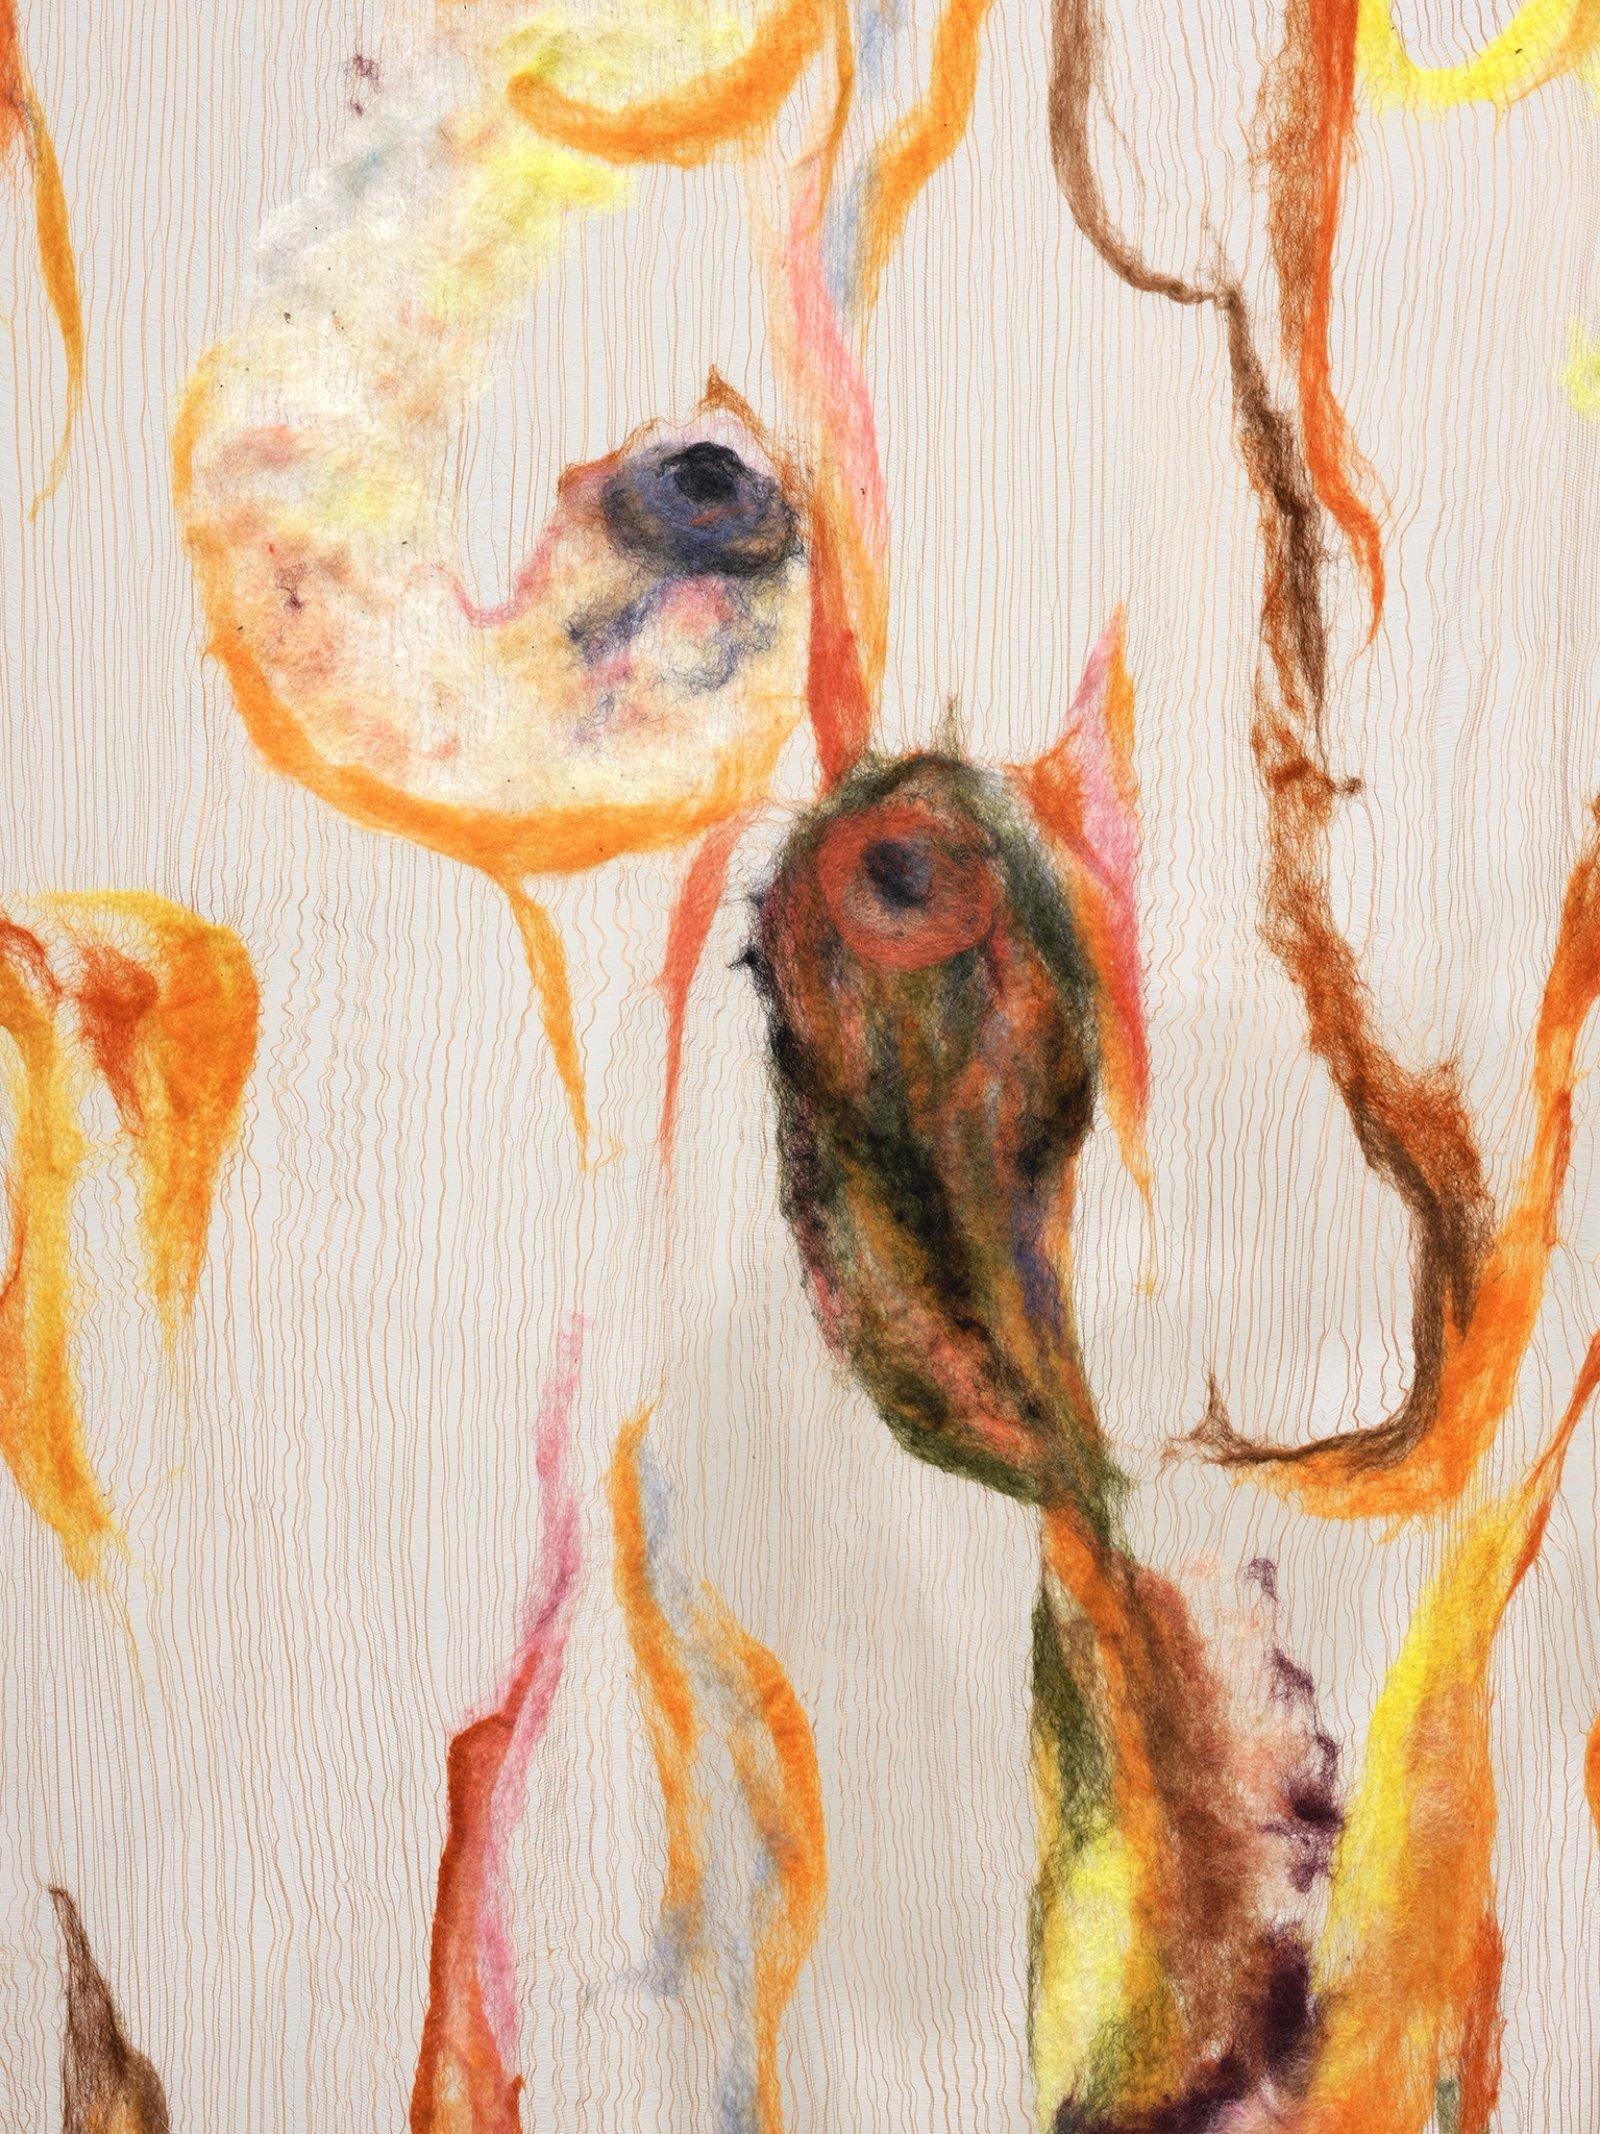 Rebecca Brewer, Scrim: Carnage (detail), 2019, silk, wool, ball chain, alligator clips, hooks, 113 x 41 in. (287 x 104 cm)